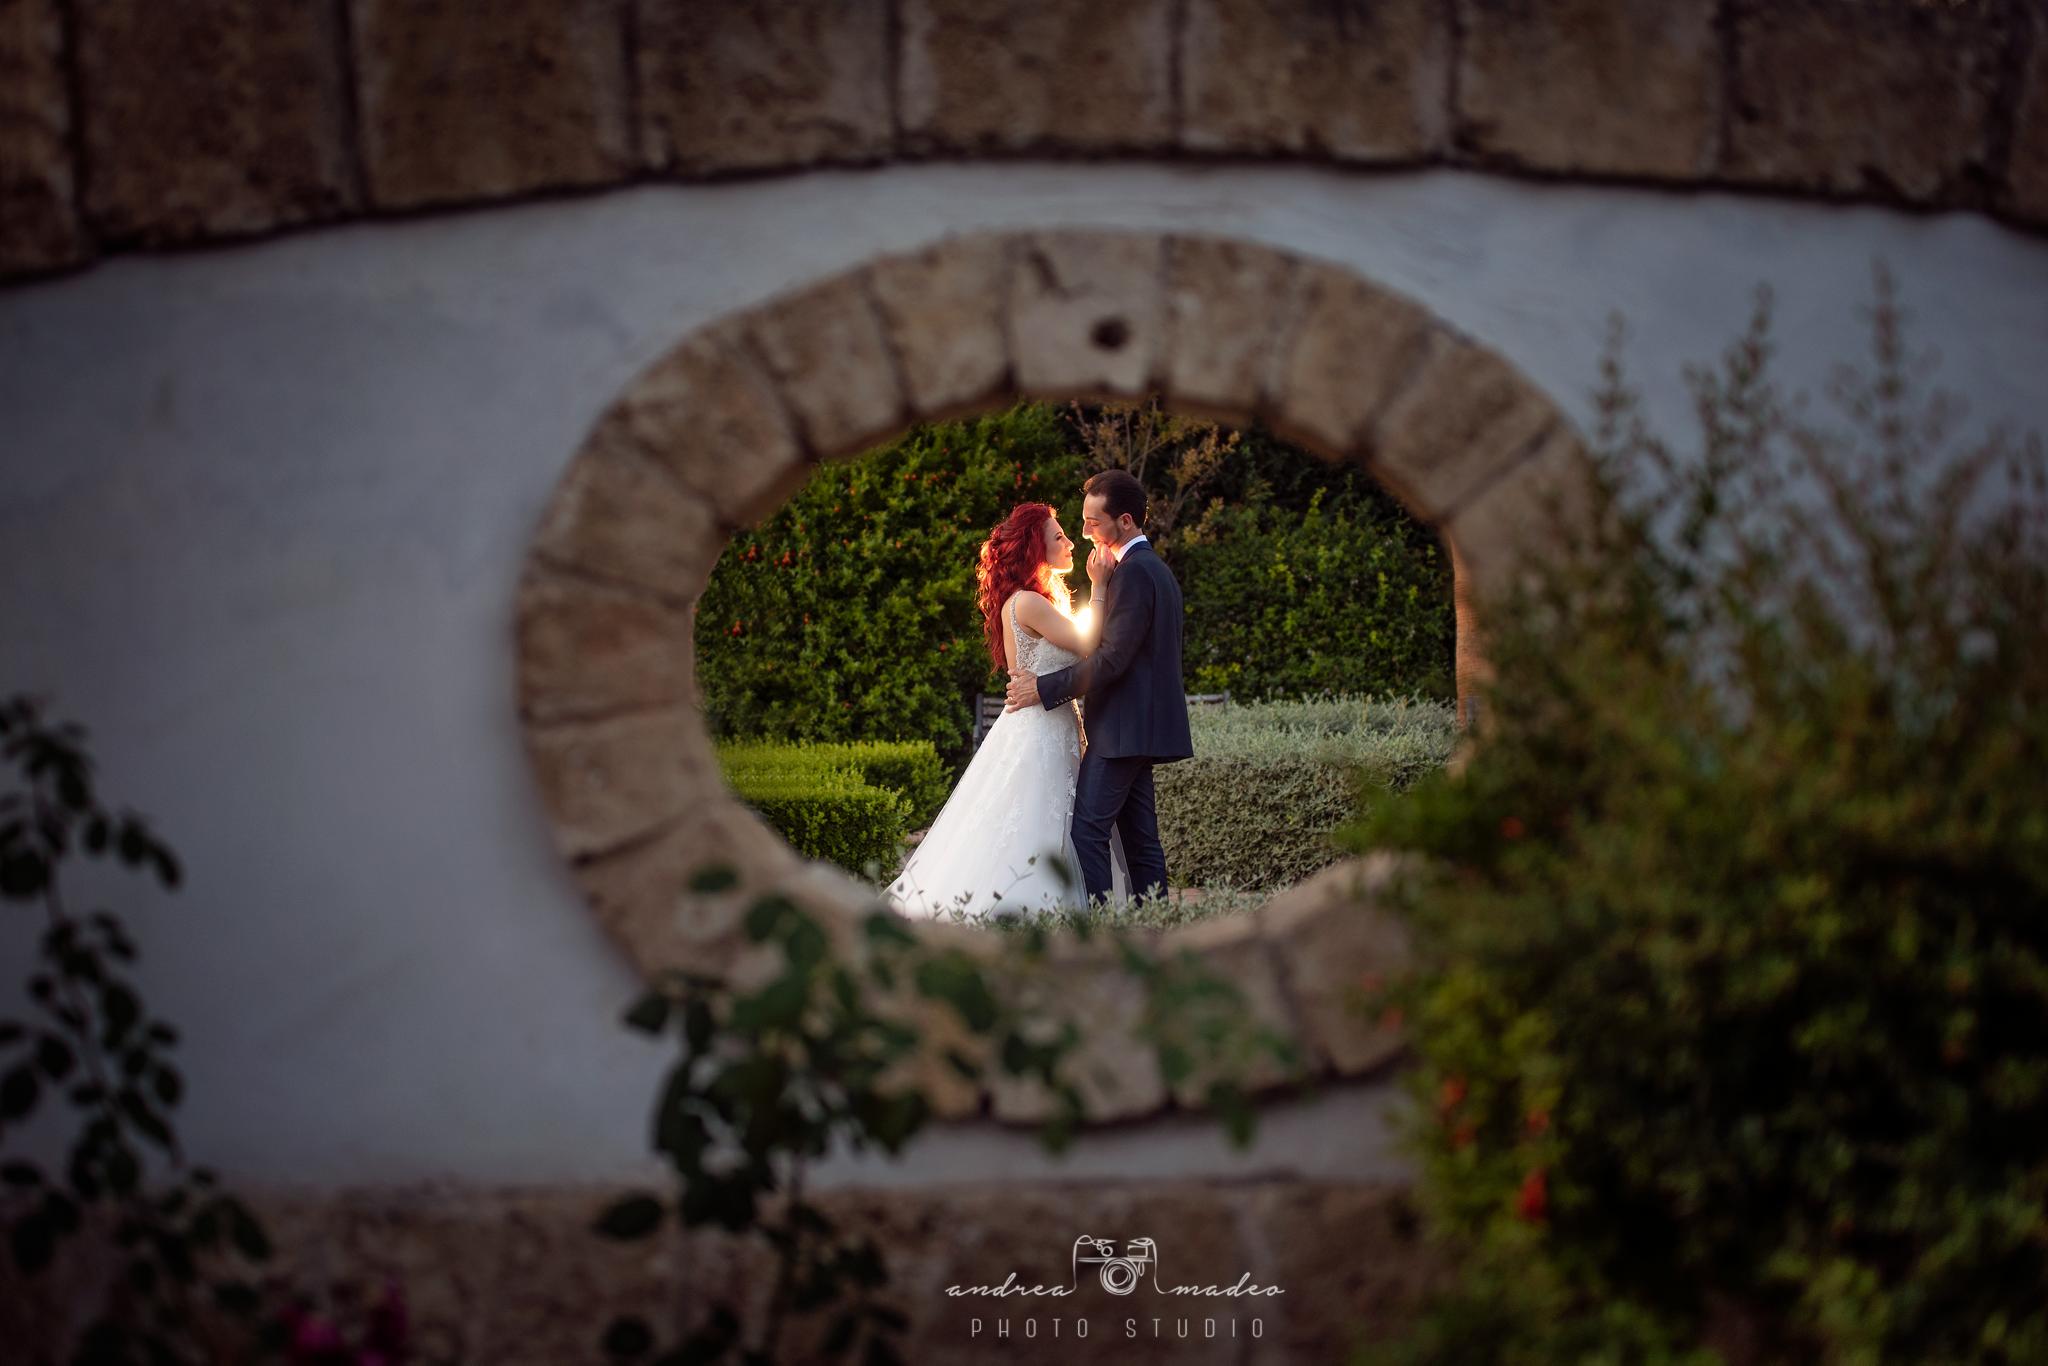 Matrimonio-Foggia-coppia